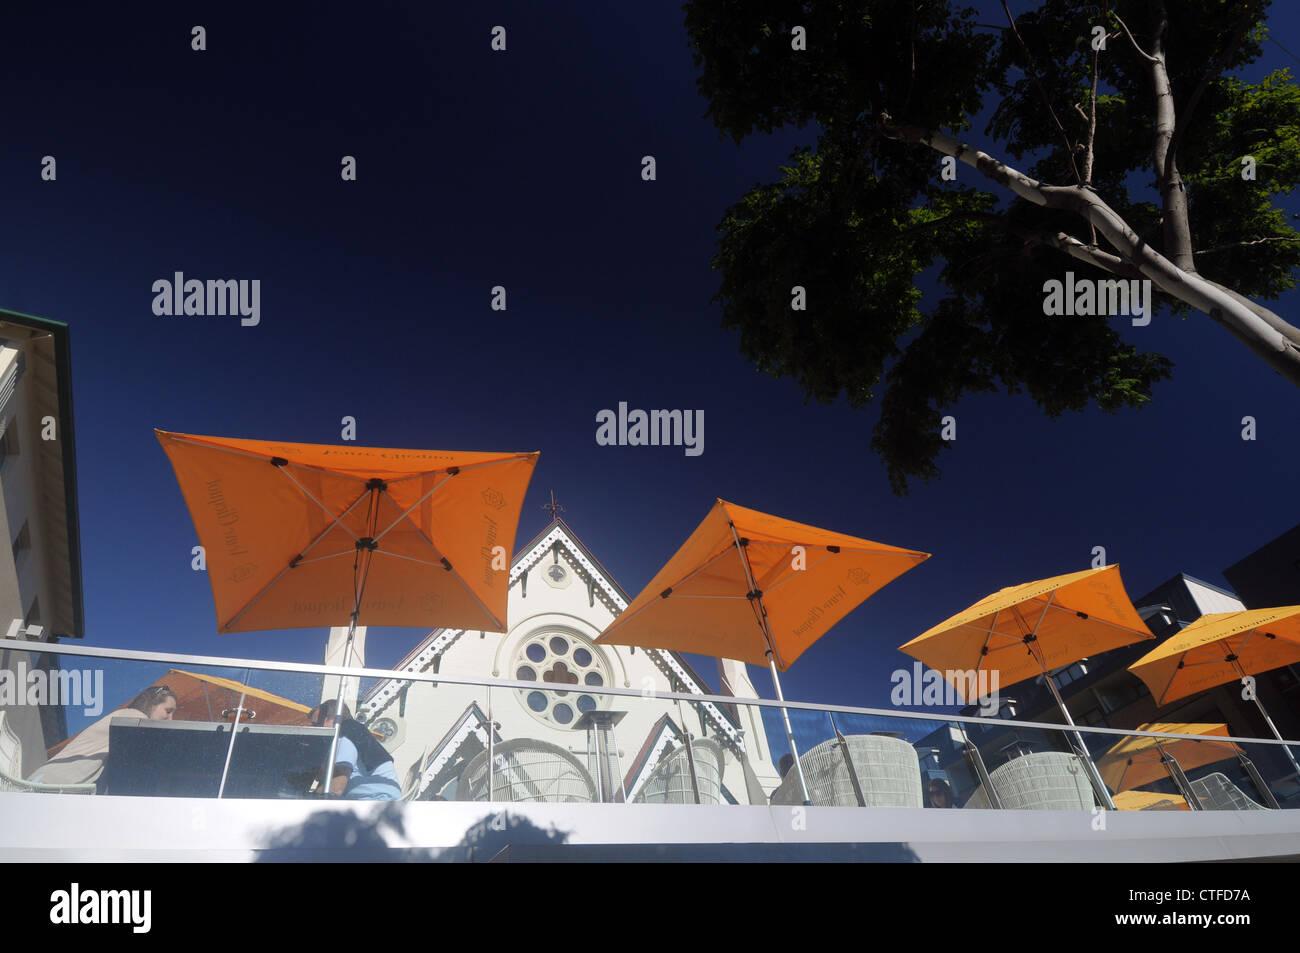 Lady Lamington Cafe, Brunswick Street, Fortitude Valley, Brisbane, Queensland, Australia. No PR or MR - Stock Image